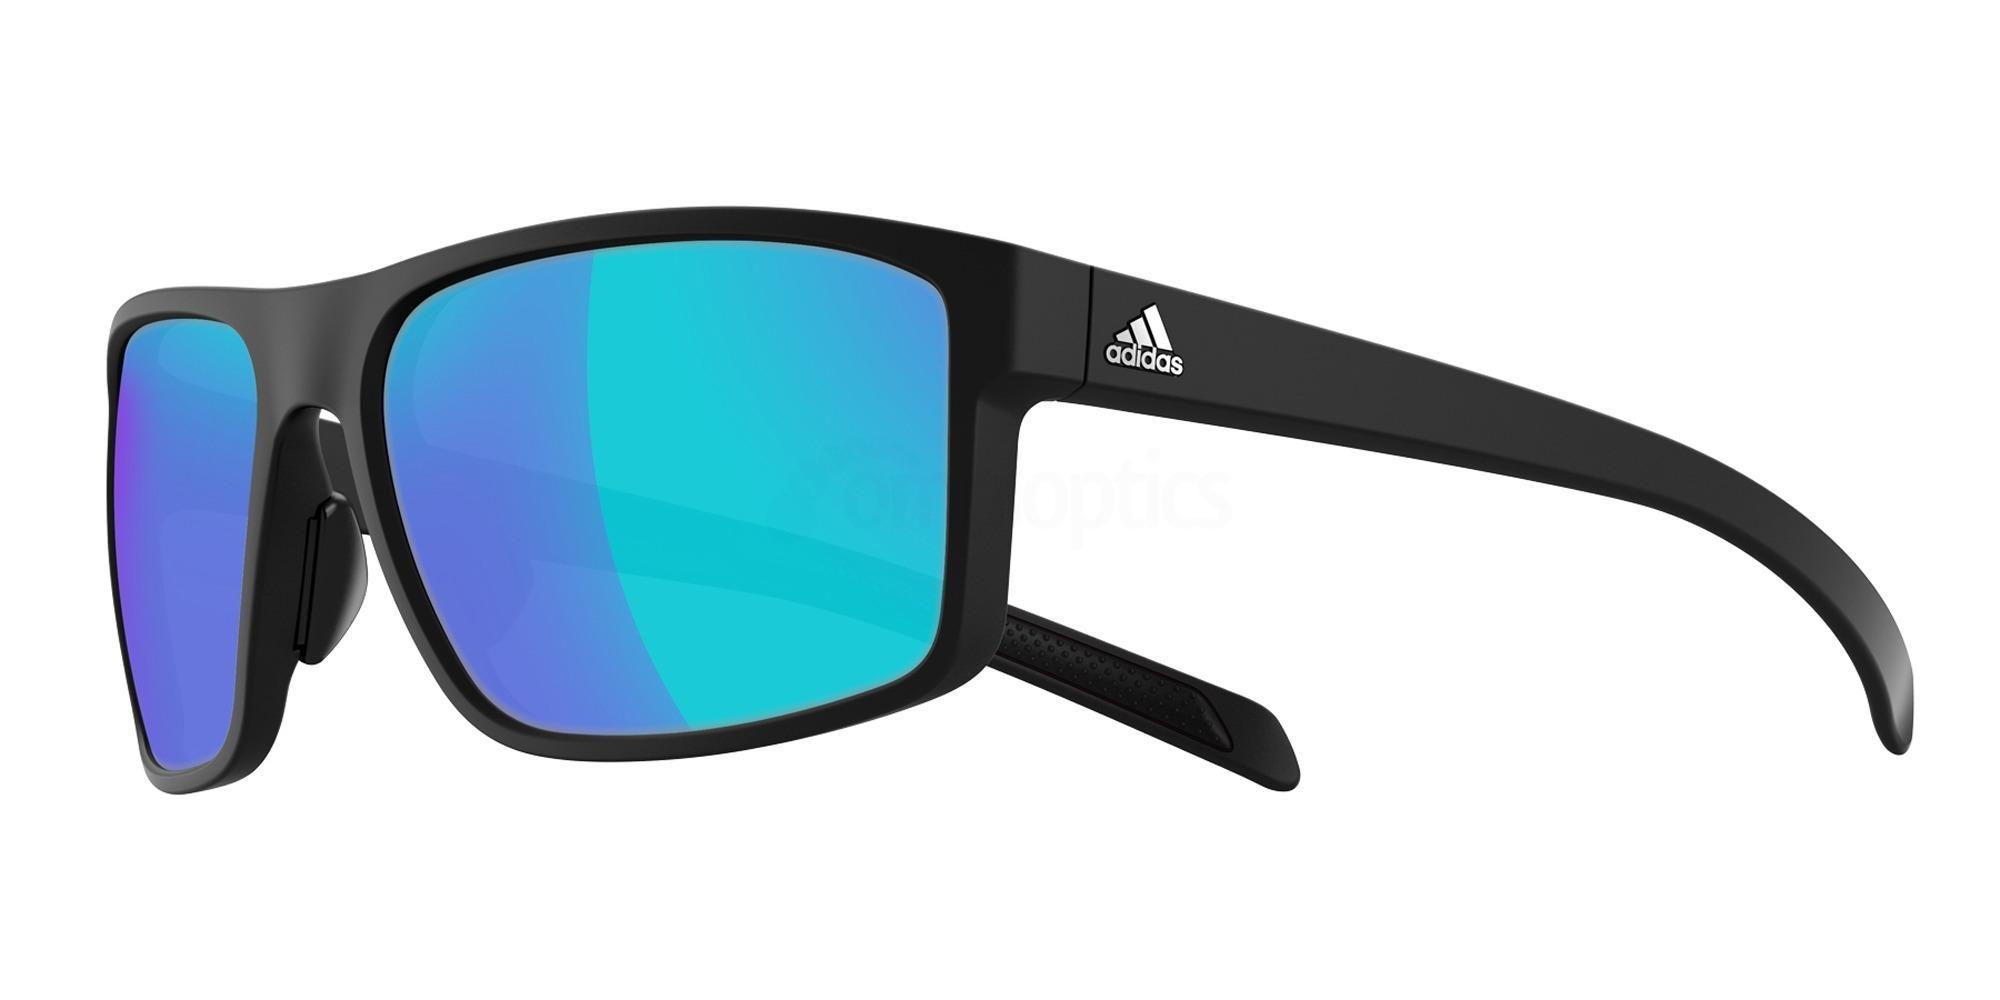 a423 00 6055 a423 whipstart Sunglasses, Adidas